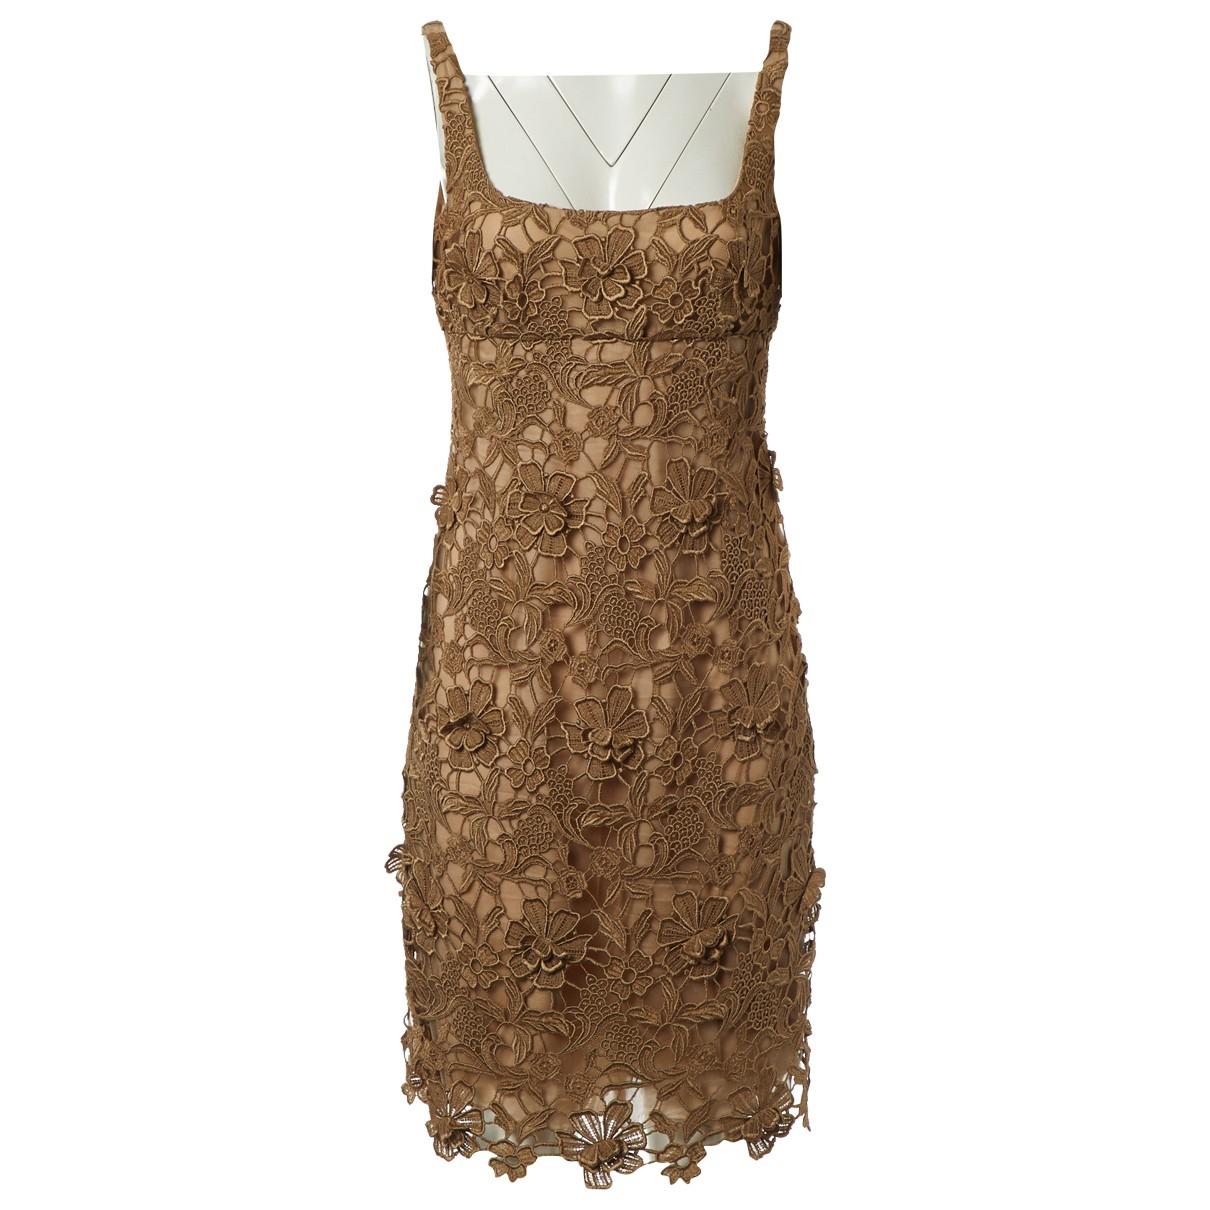 Valentino Garavani \N Beige dress for Women 6 UK